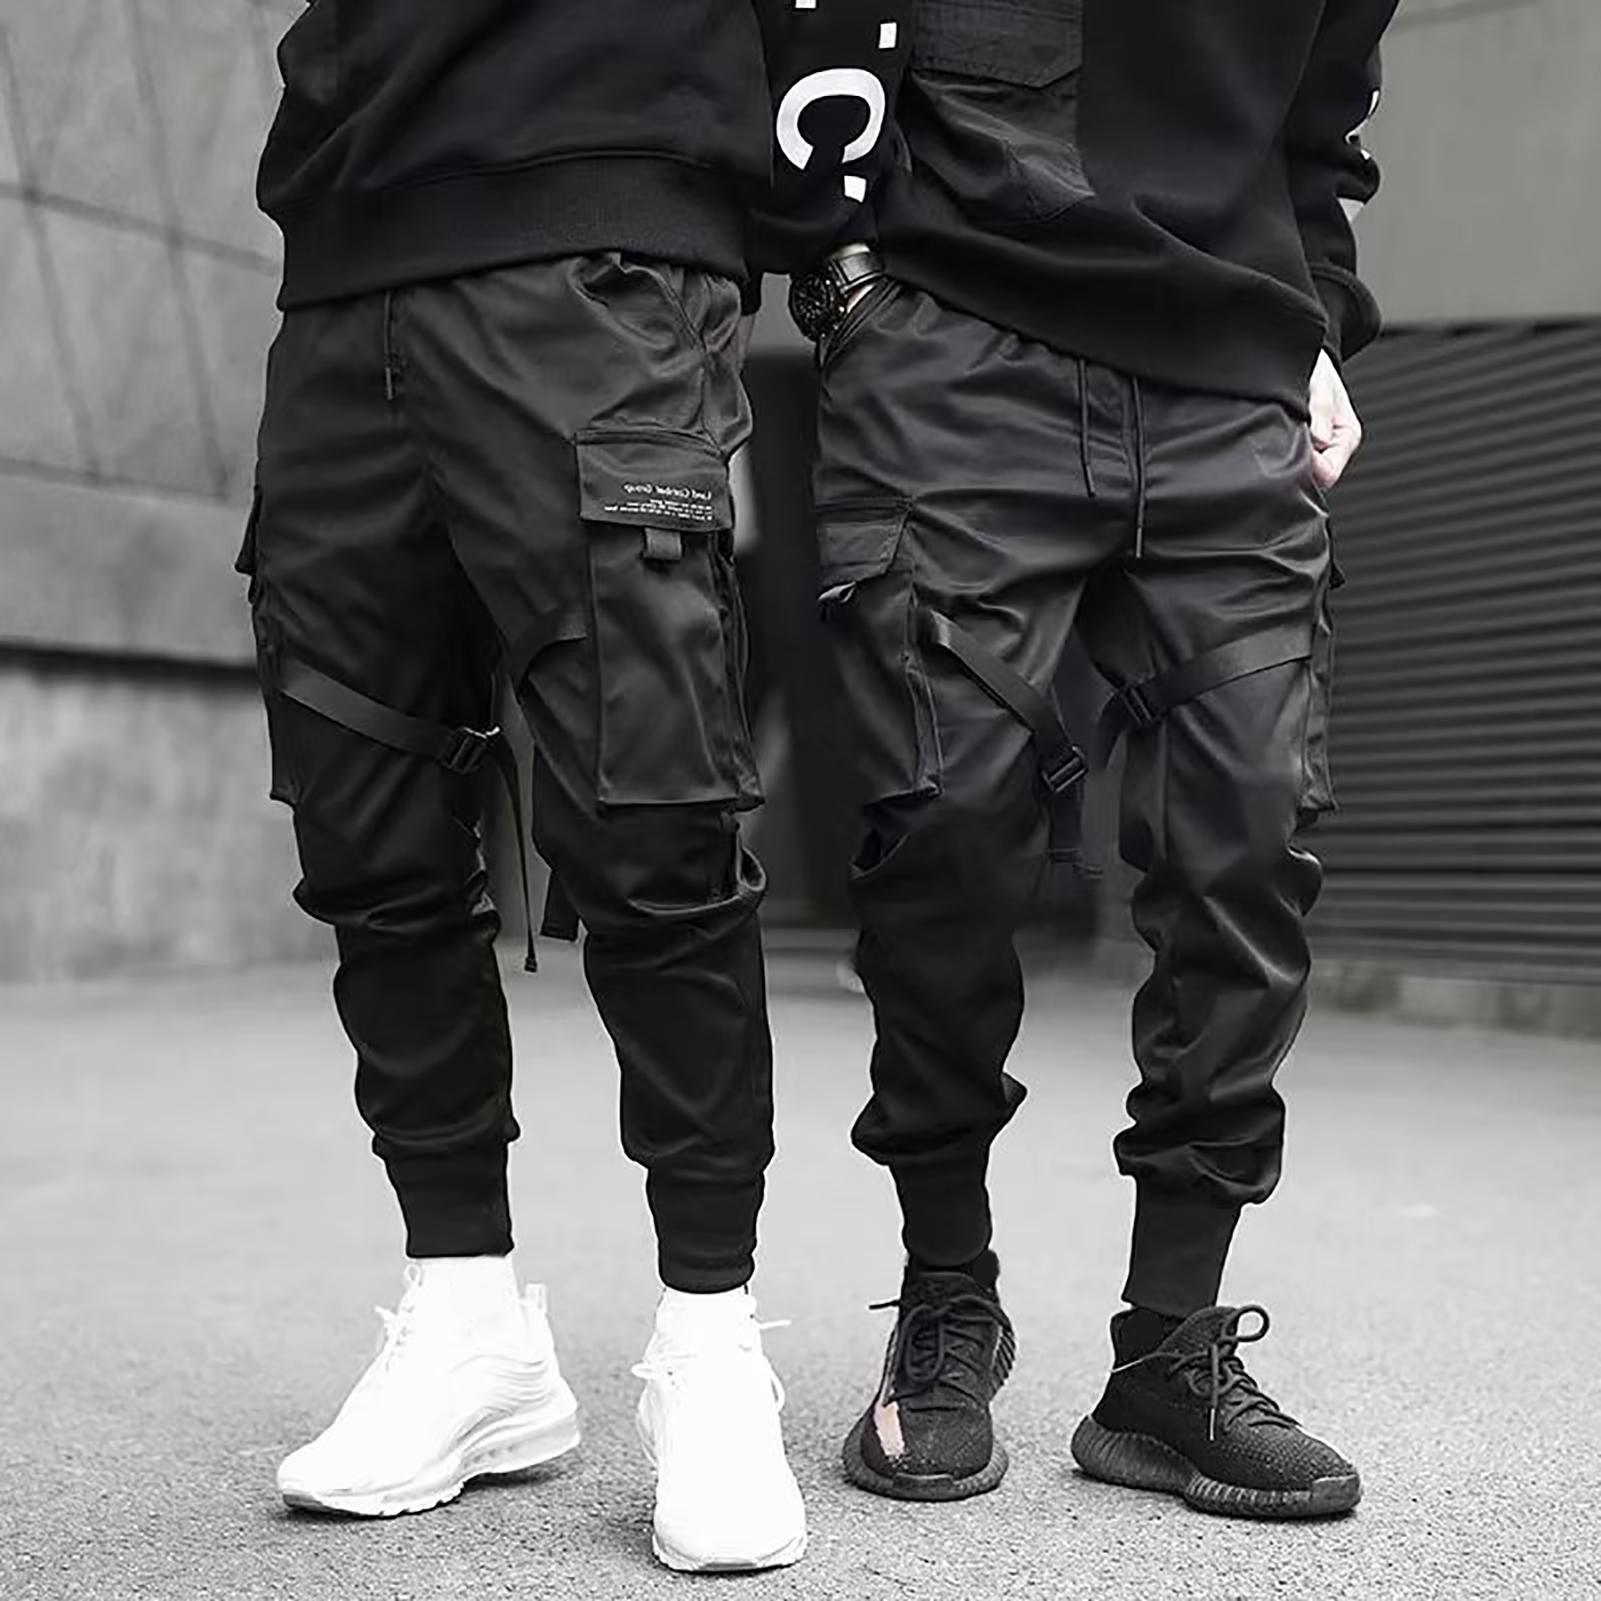 Men Sweatshirts Jogging Pants Men Casual Pants Men Fashion Drawstring Multi Pockets Straps Ankle Tied Cargo Pants Long Trousers